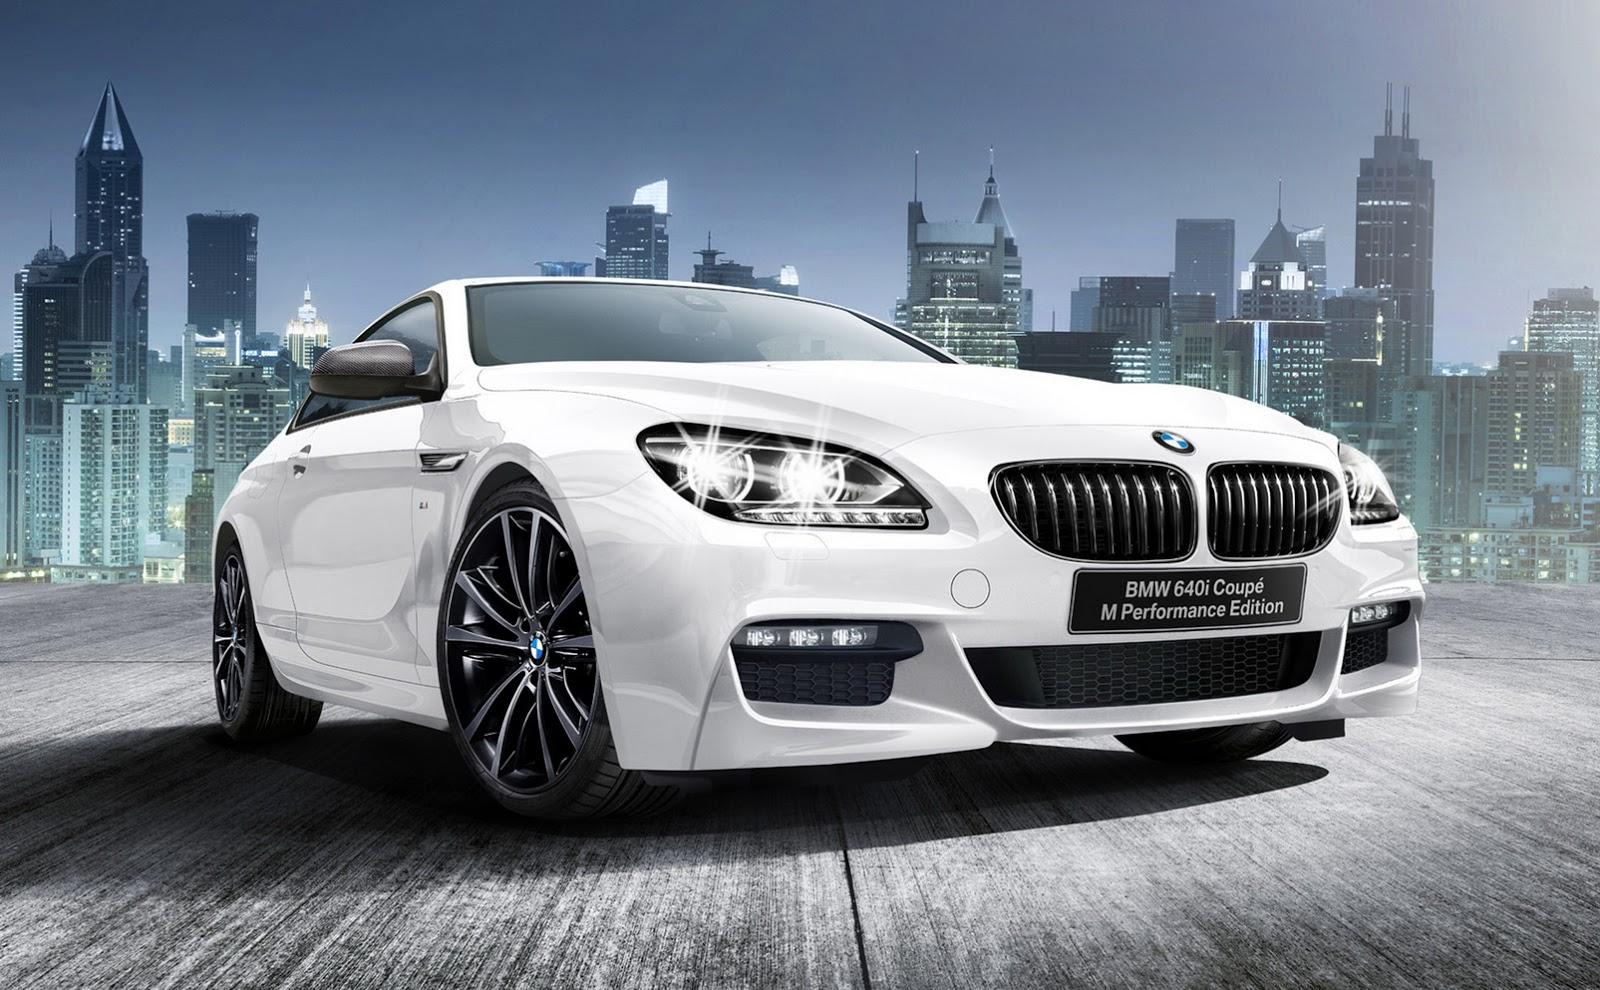 BMW выпустил 640i 2016 Coupe M Performance Edition